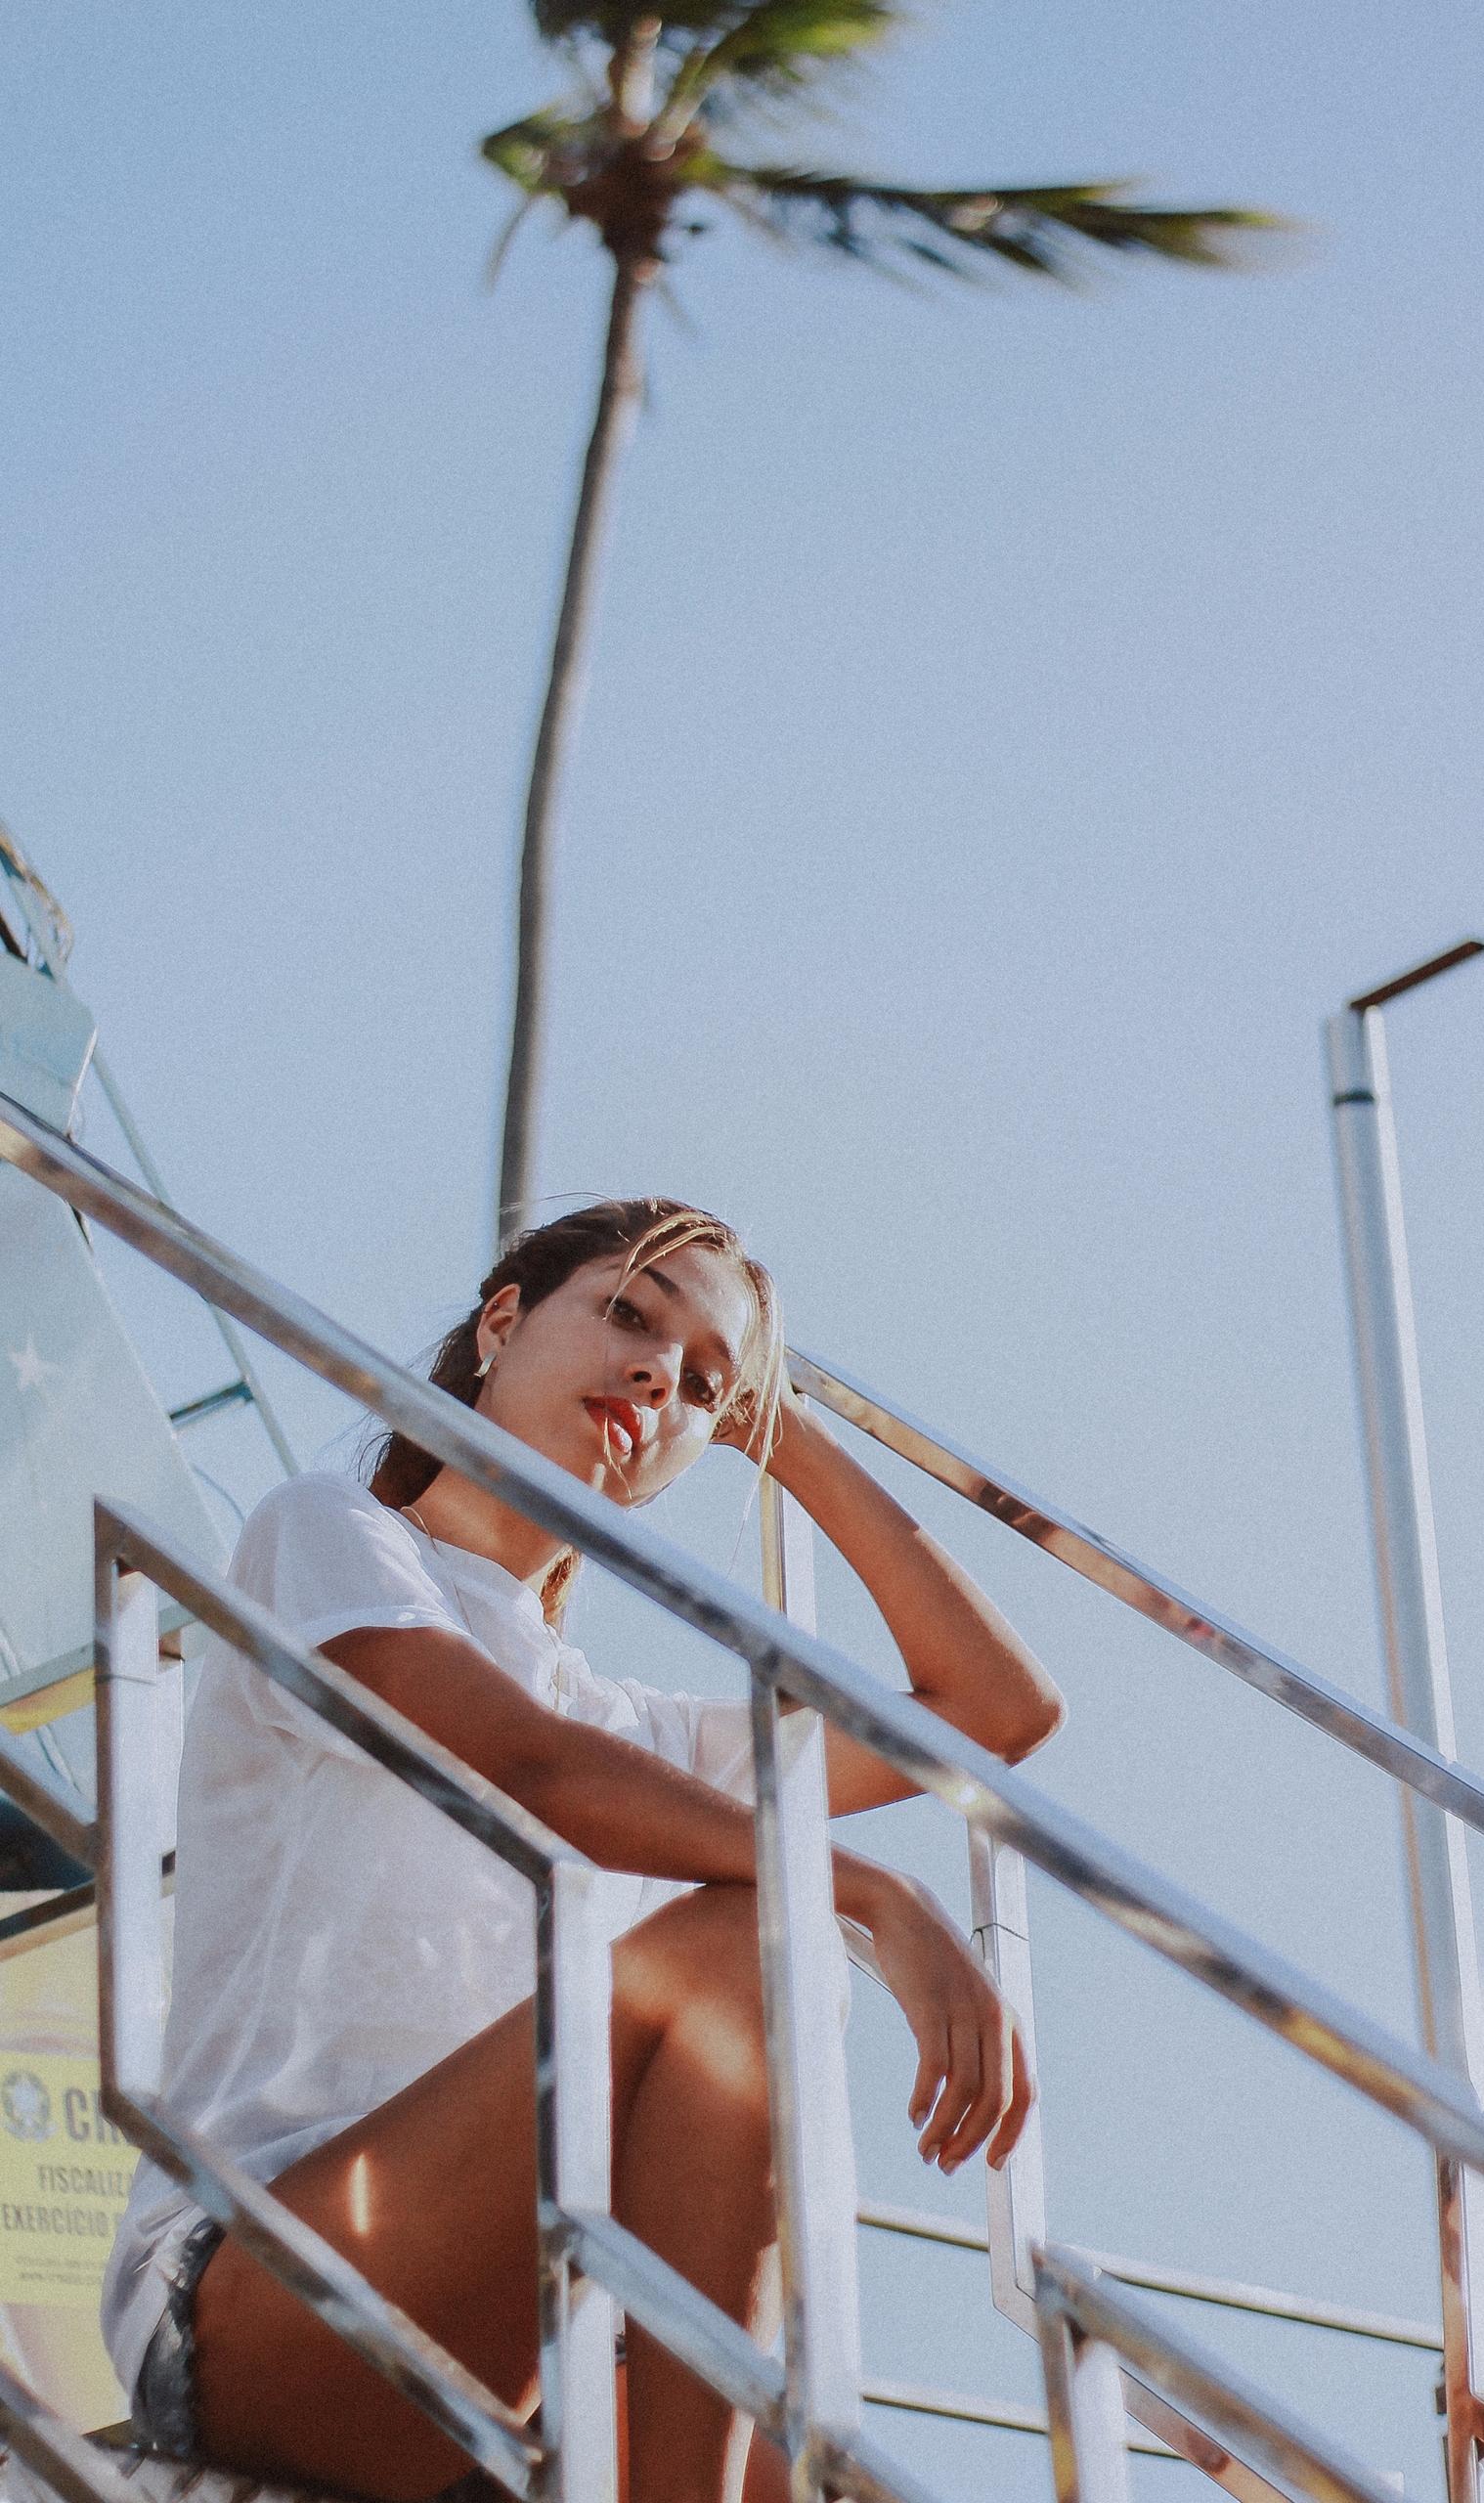 vibin , ,#collorpallets - street - caiqueportraits | ello